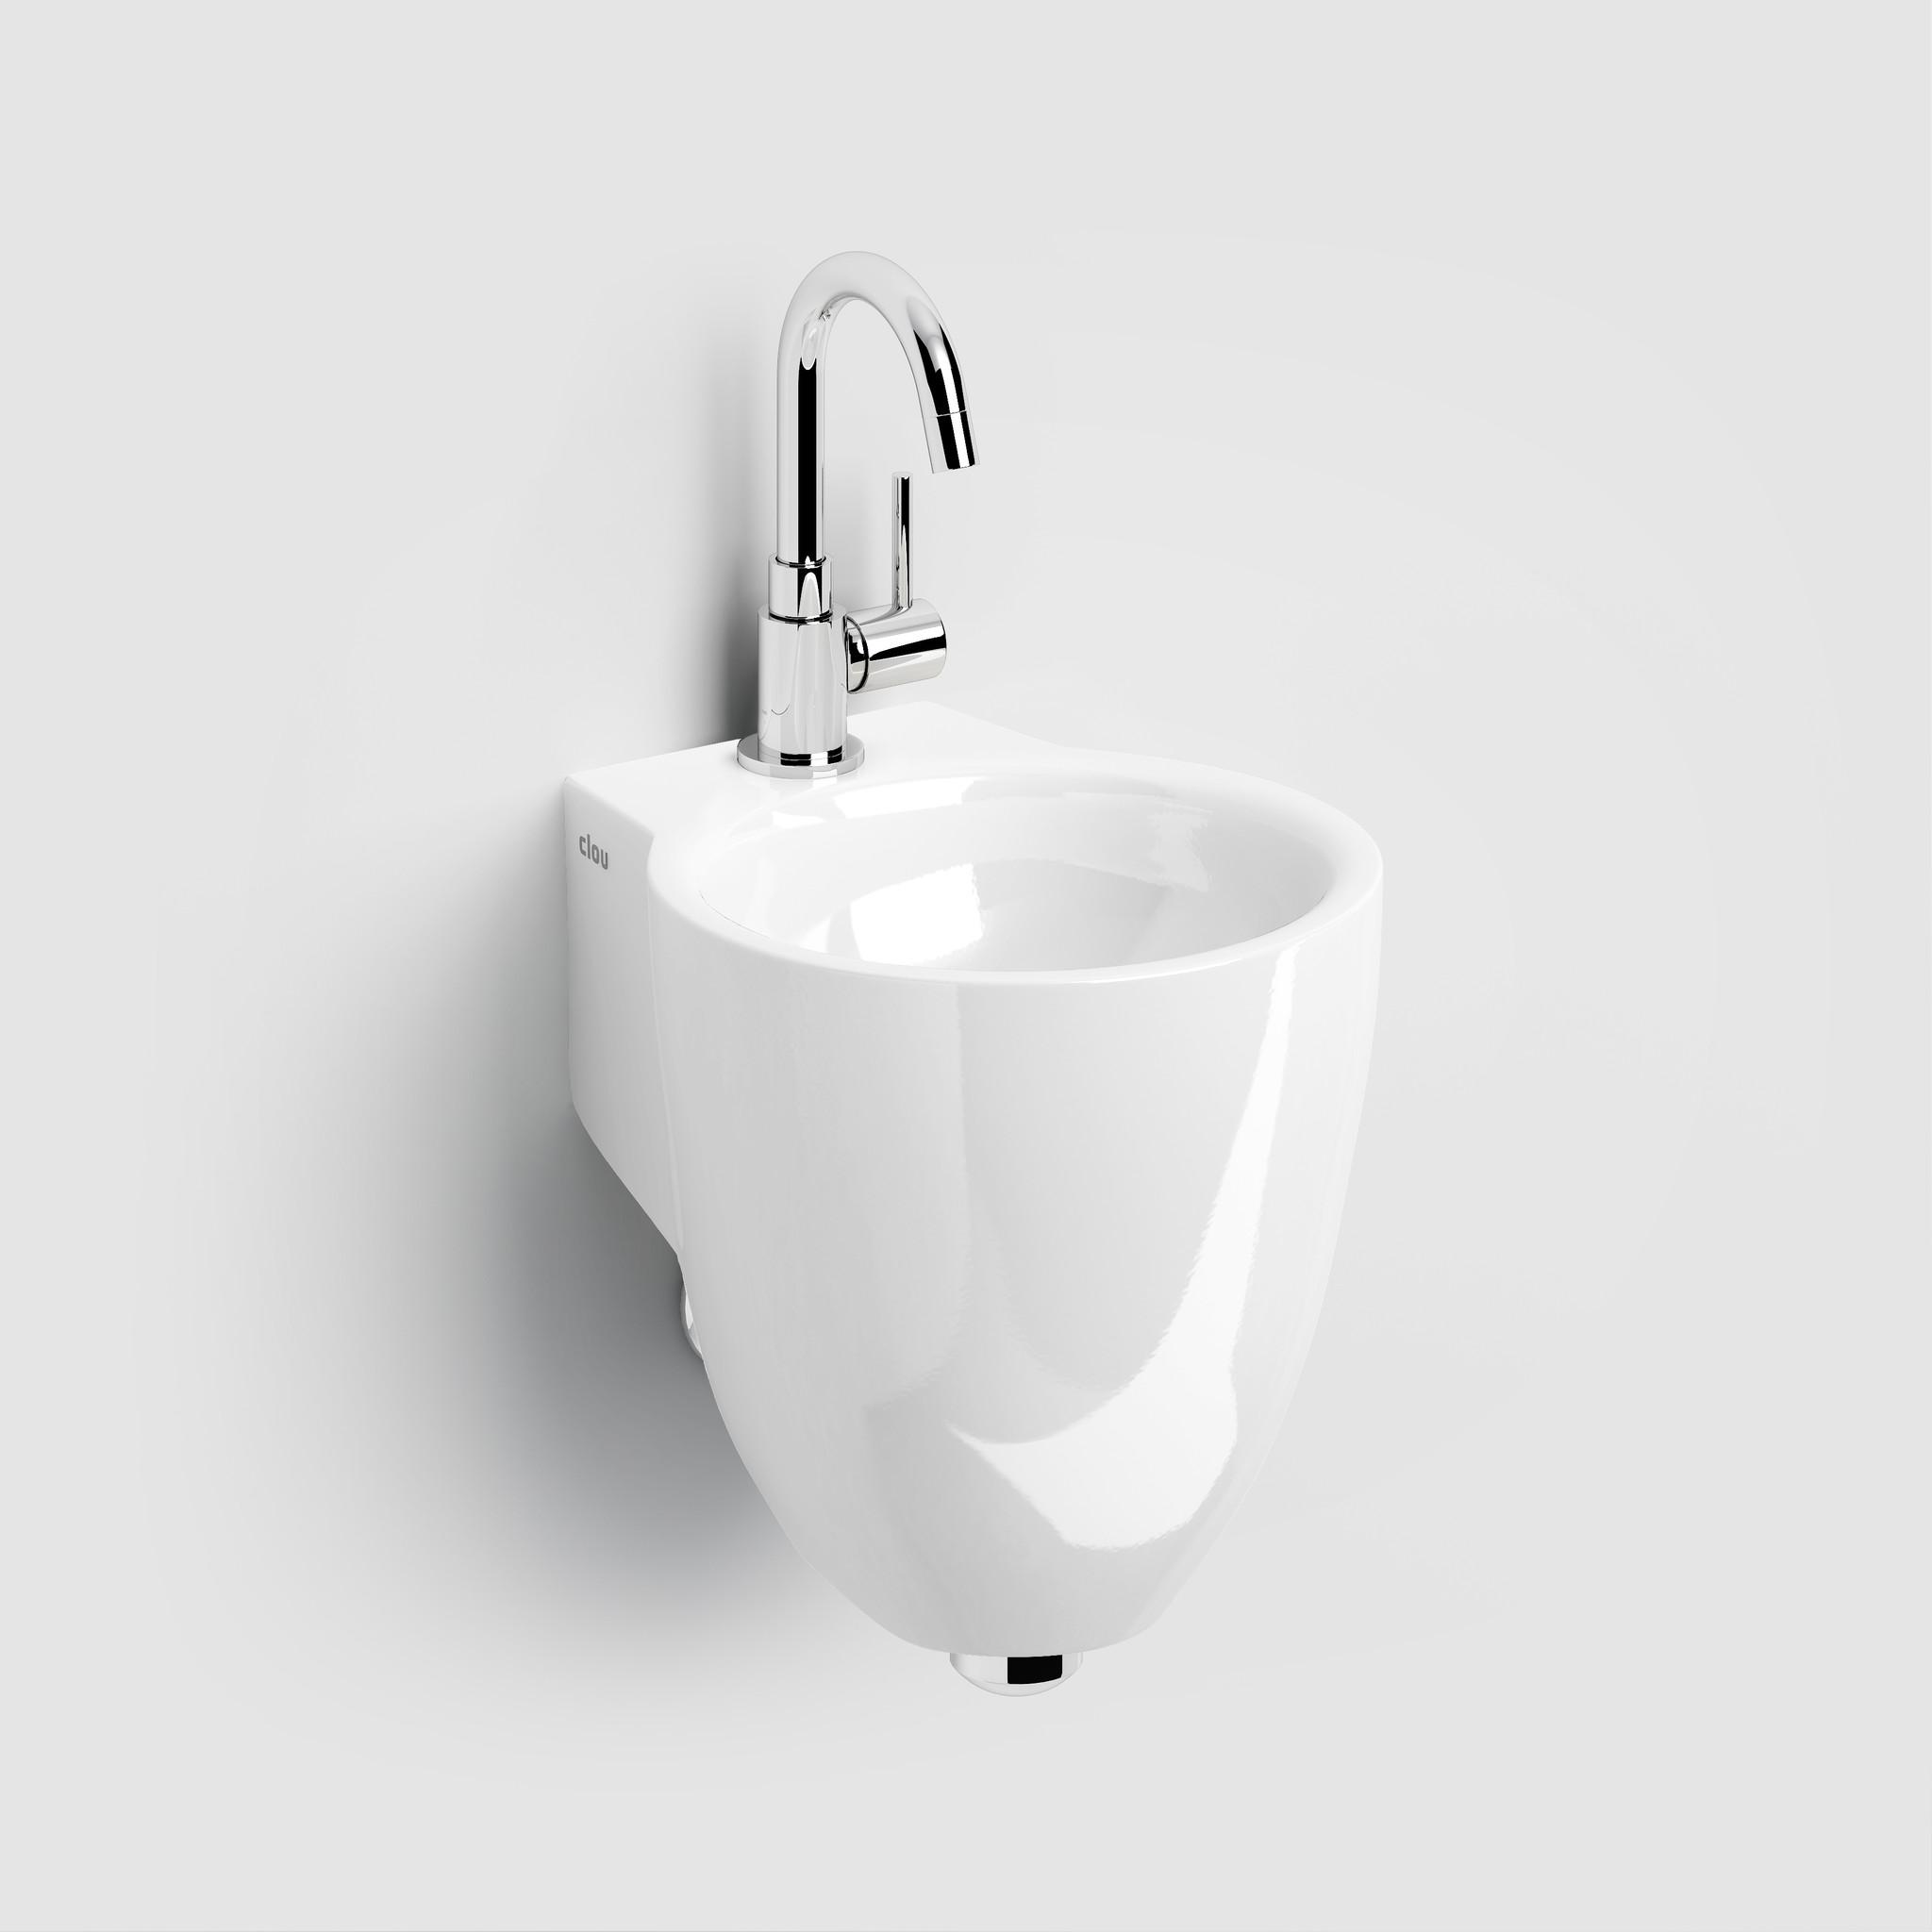 Flush trap for Flush 6, chrome